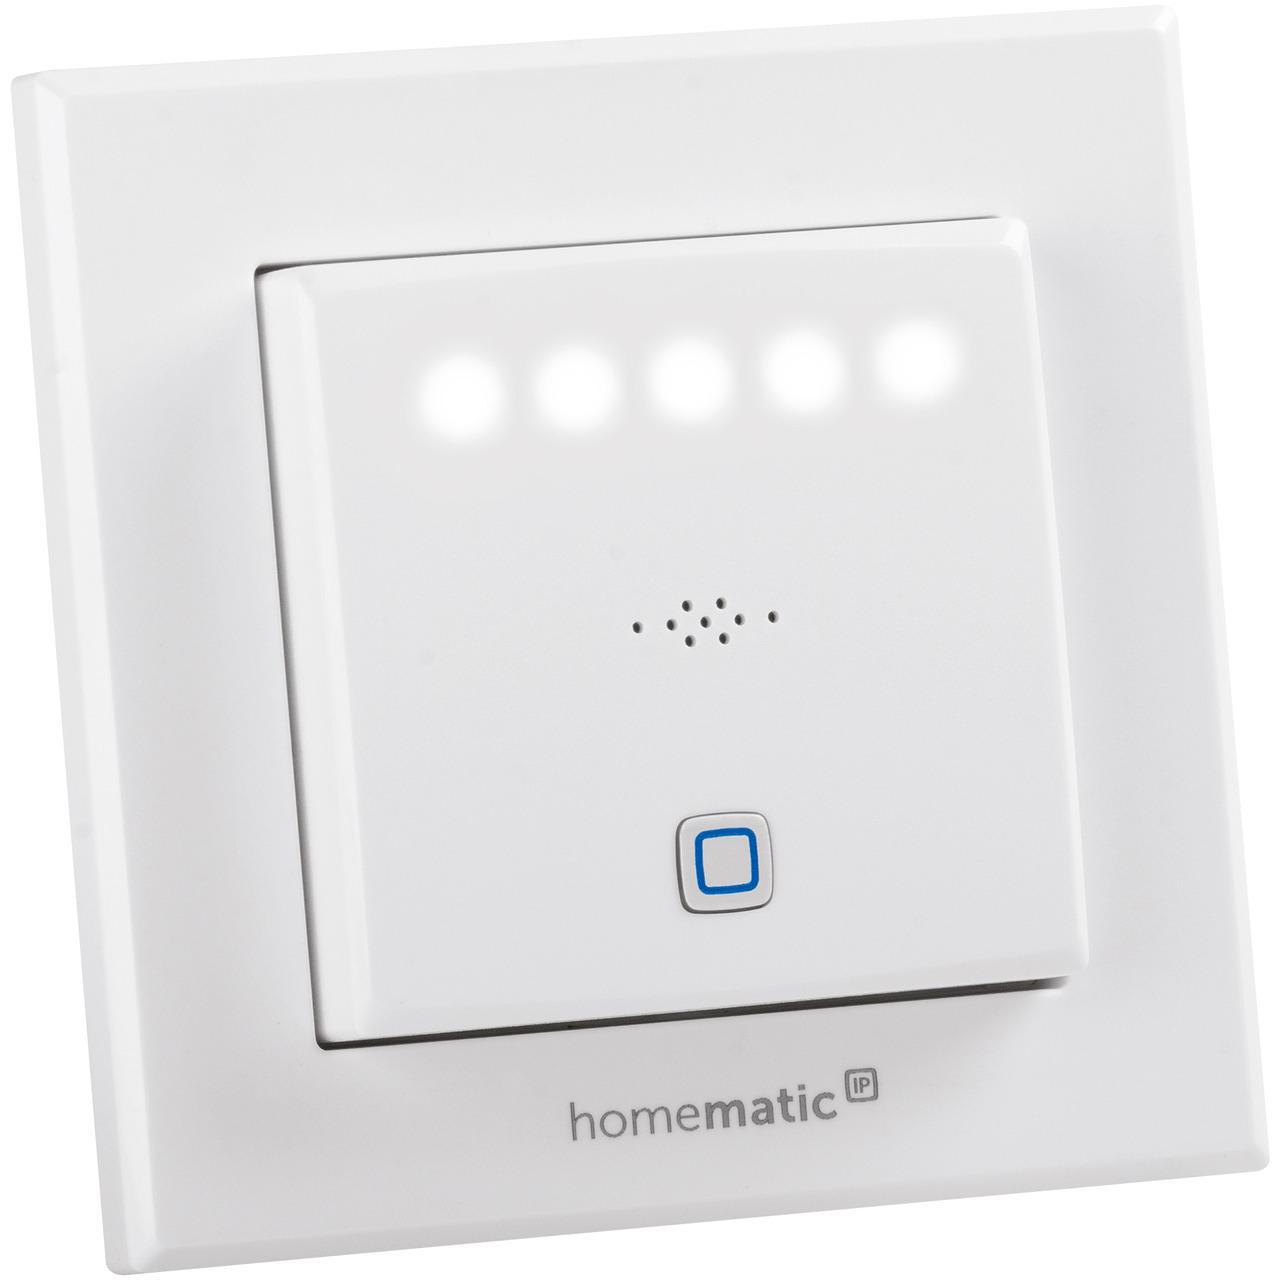 ELV Homematic IP Bausatz CO2-Sensor HmIP-SCTH230- 230 V